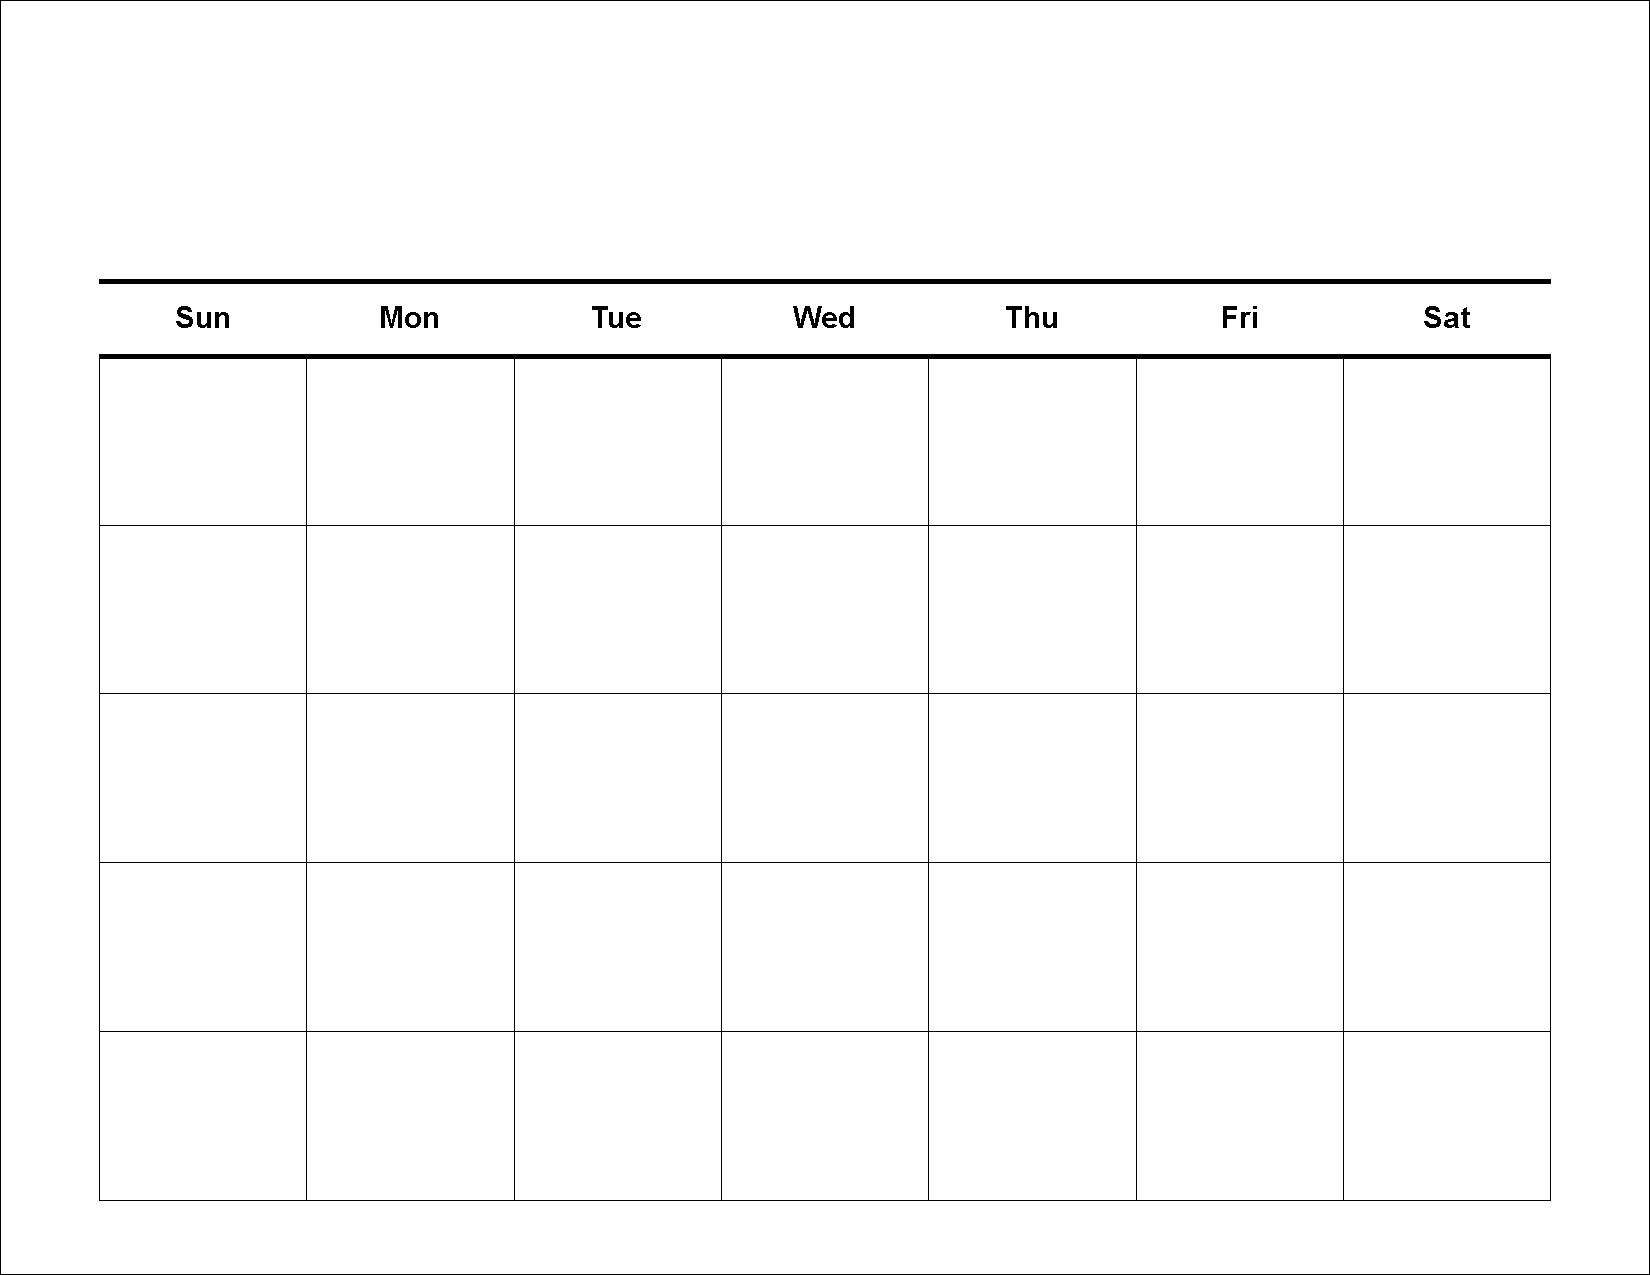 Print Blank Calendar Monthly Archives - Hashtag Bg Is A Calendar Month 4 Weeks